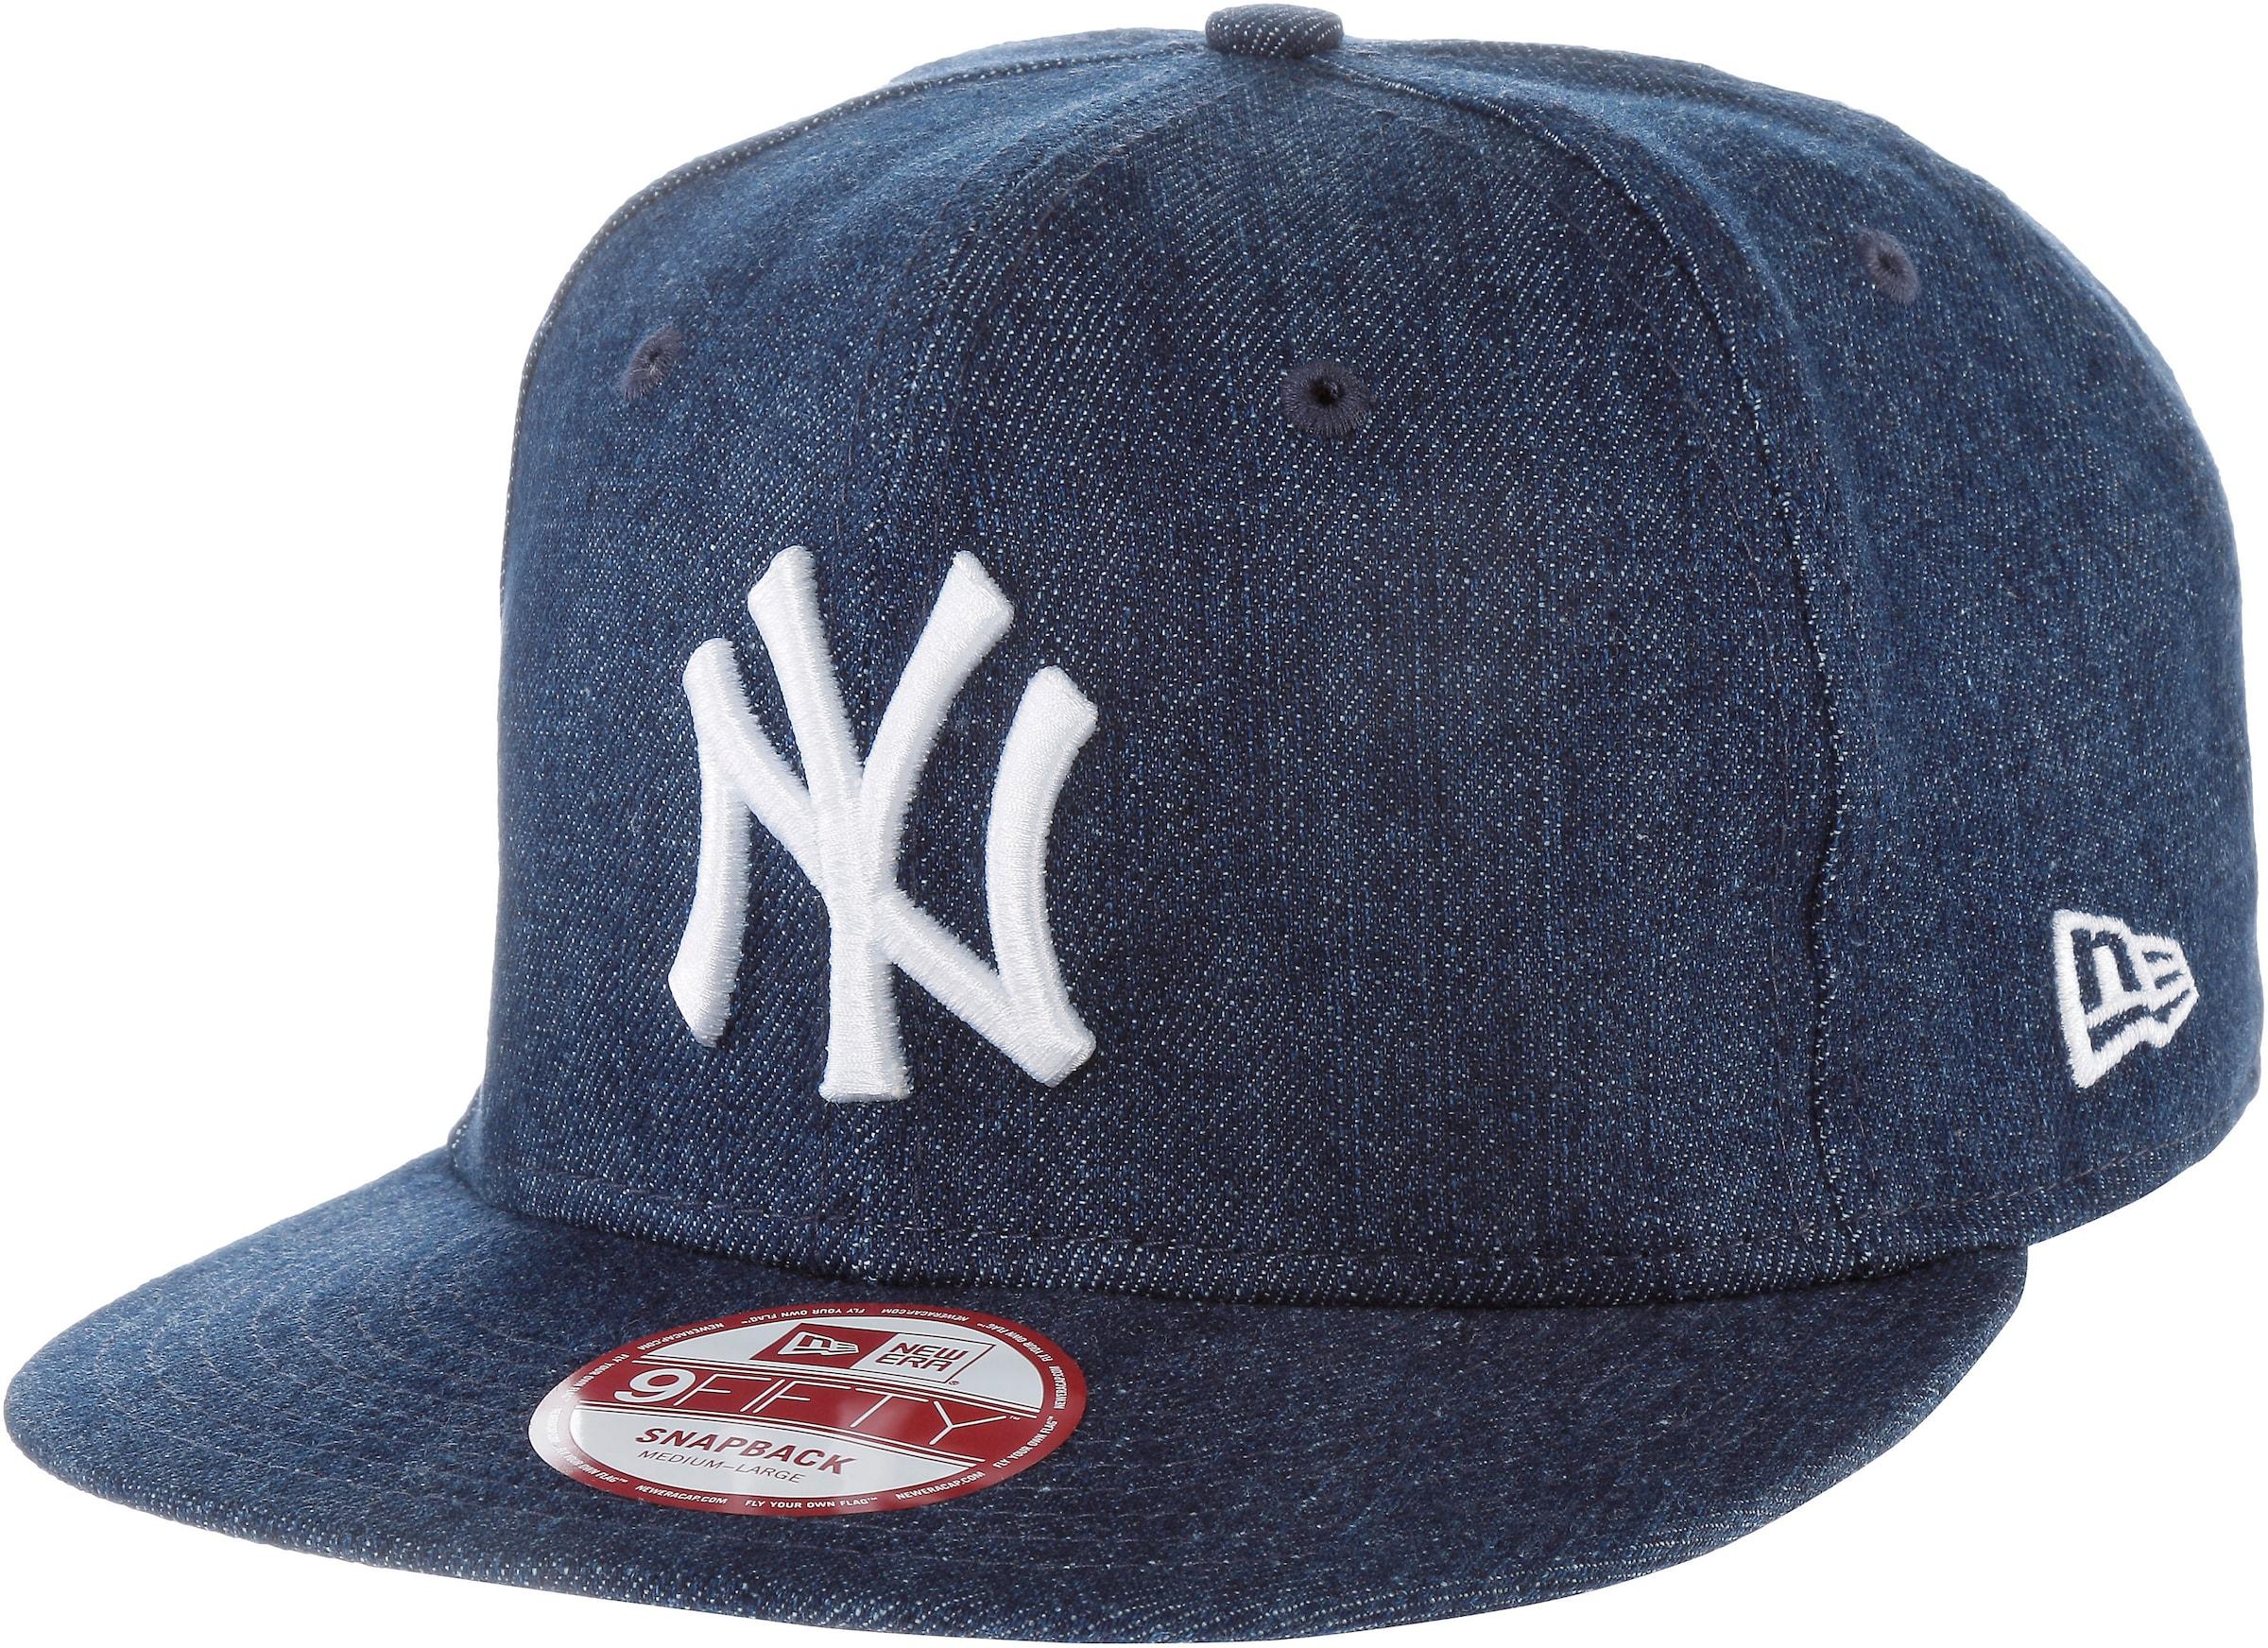 Neuesten Kollektionen Zu Verkaufen NEW ERA Cap '9FIFTY League Essential New York Yankees' Freies Verschiffen Finish Rabatt Modische 7TvyOFIY